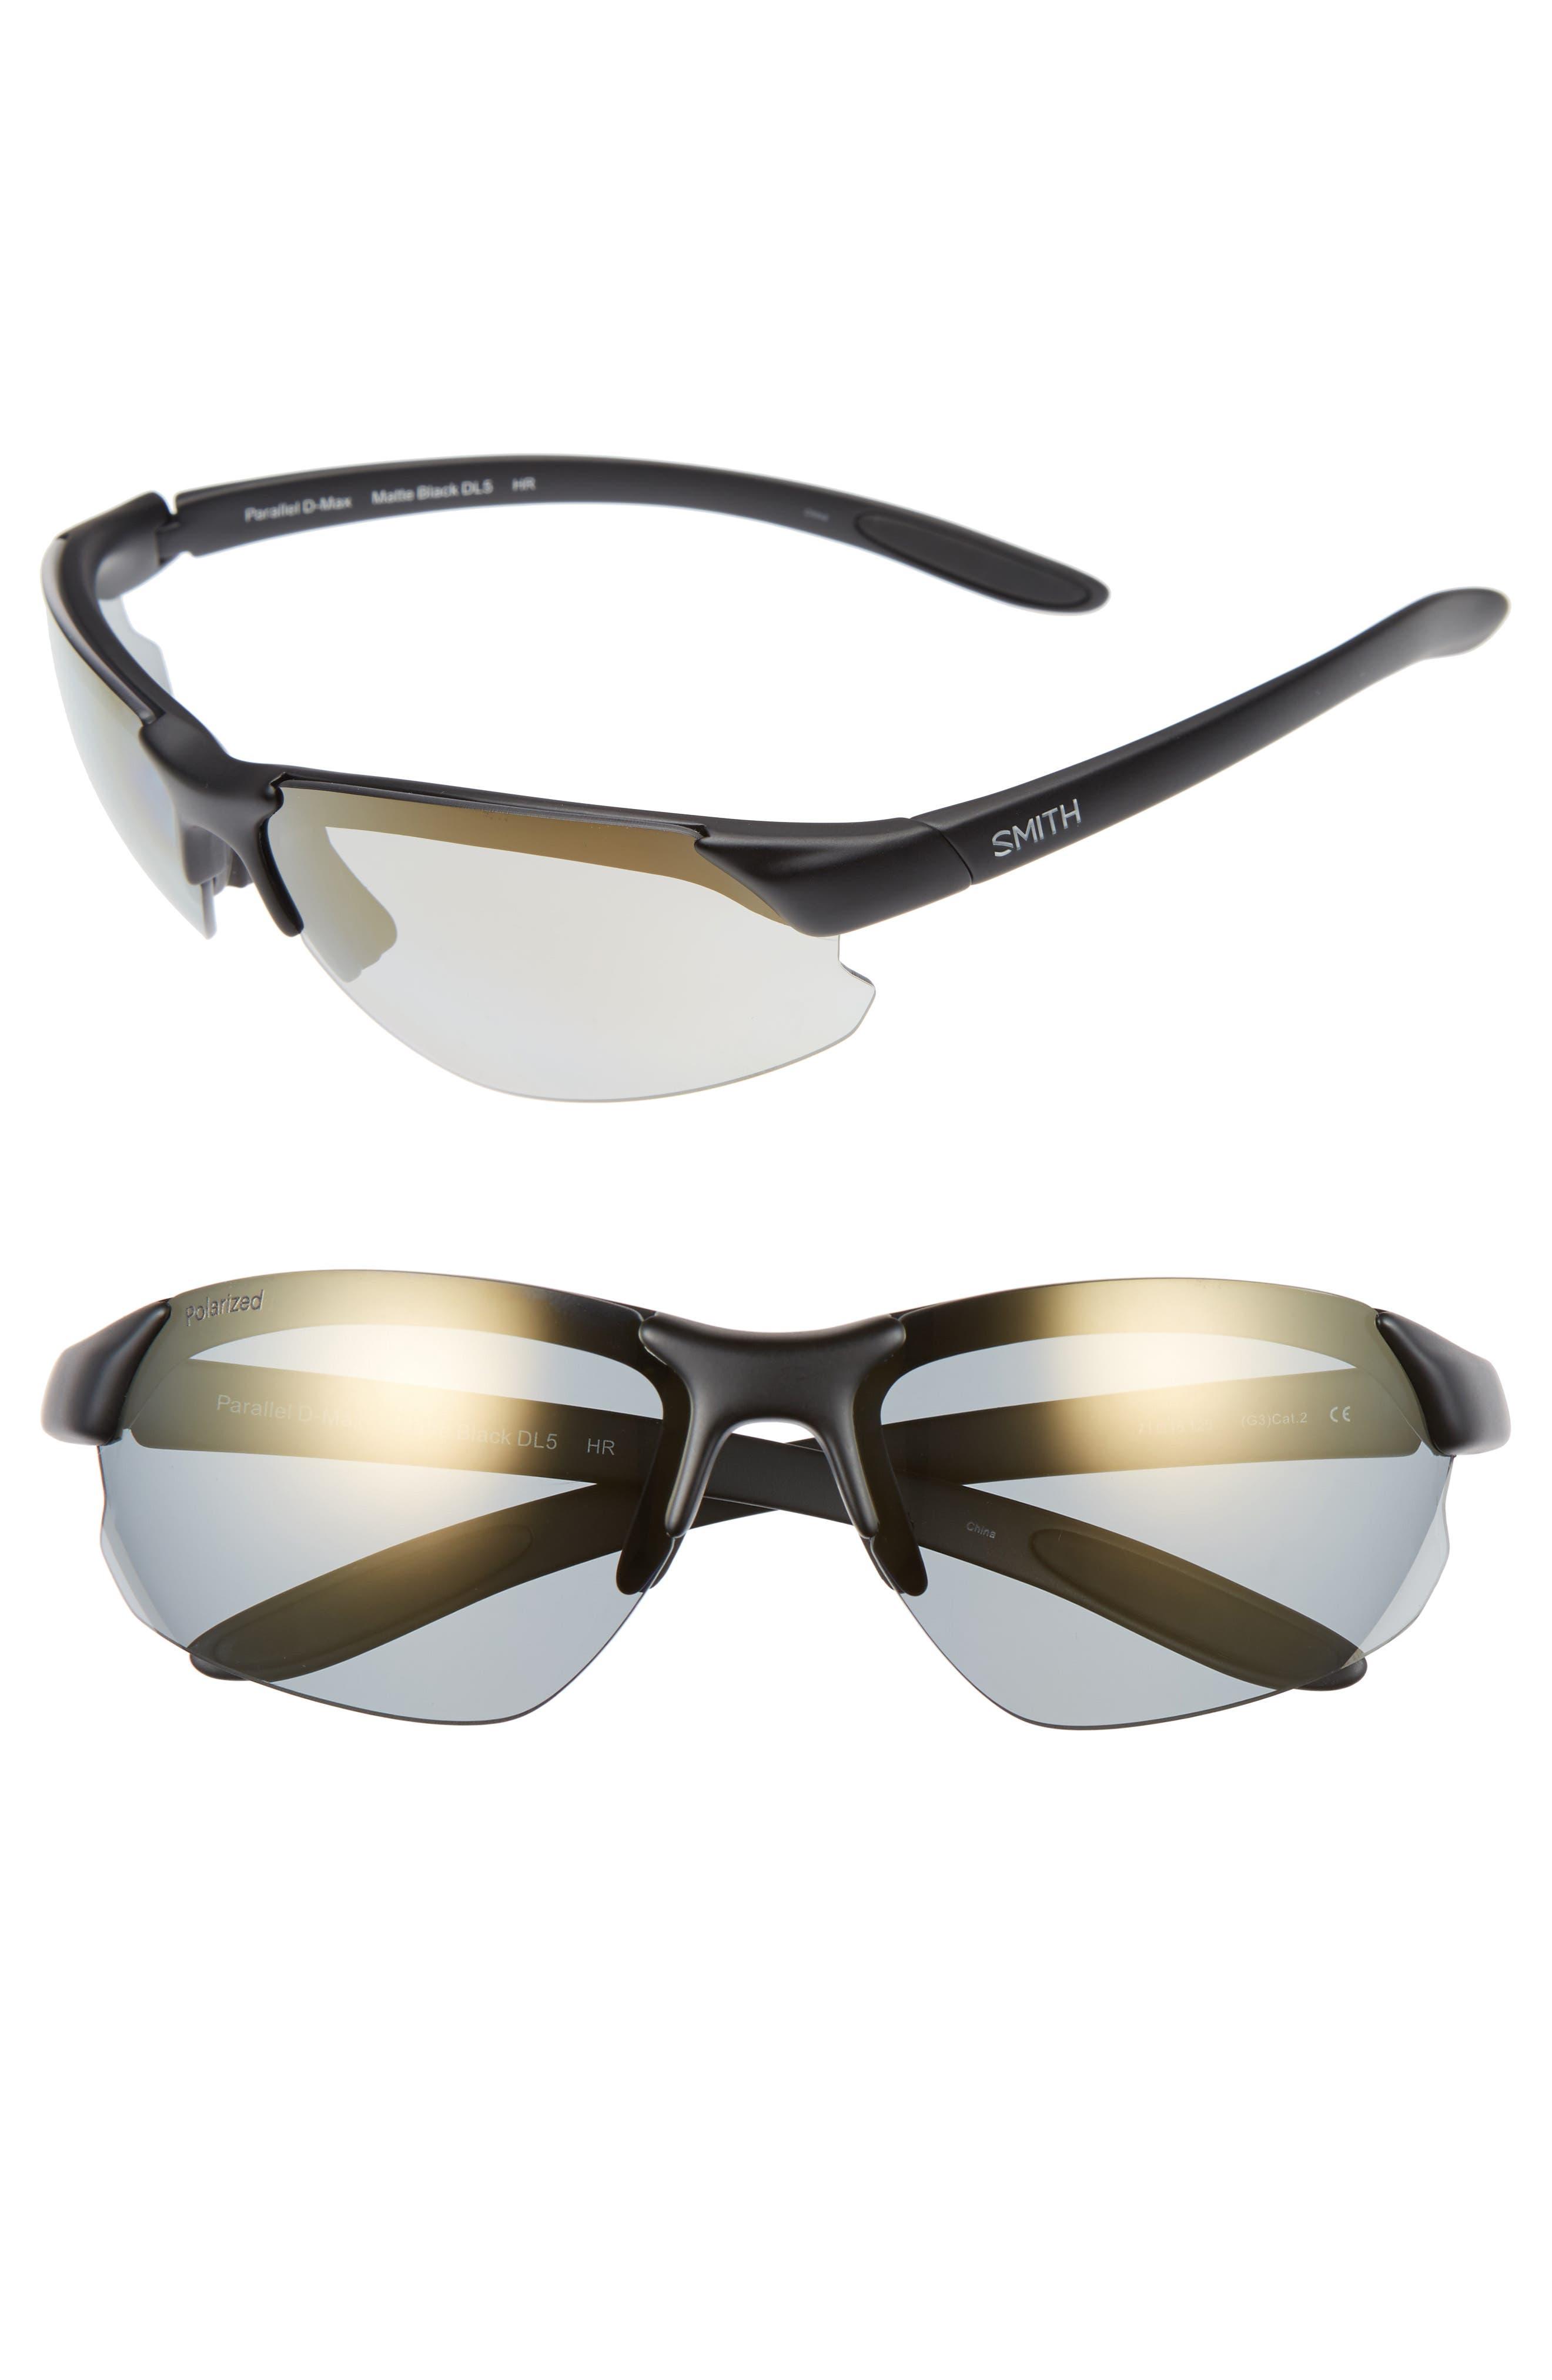 Parallel Max 69mm Polarized Sunglasses,                         Main,                         color, 001